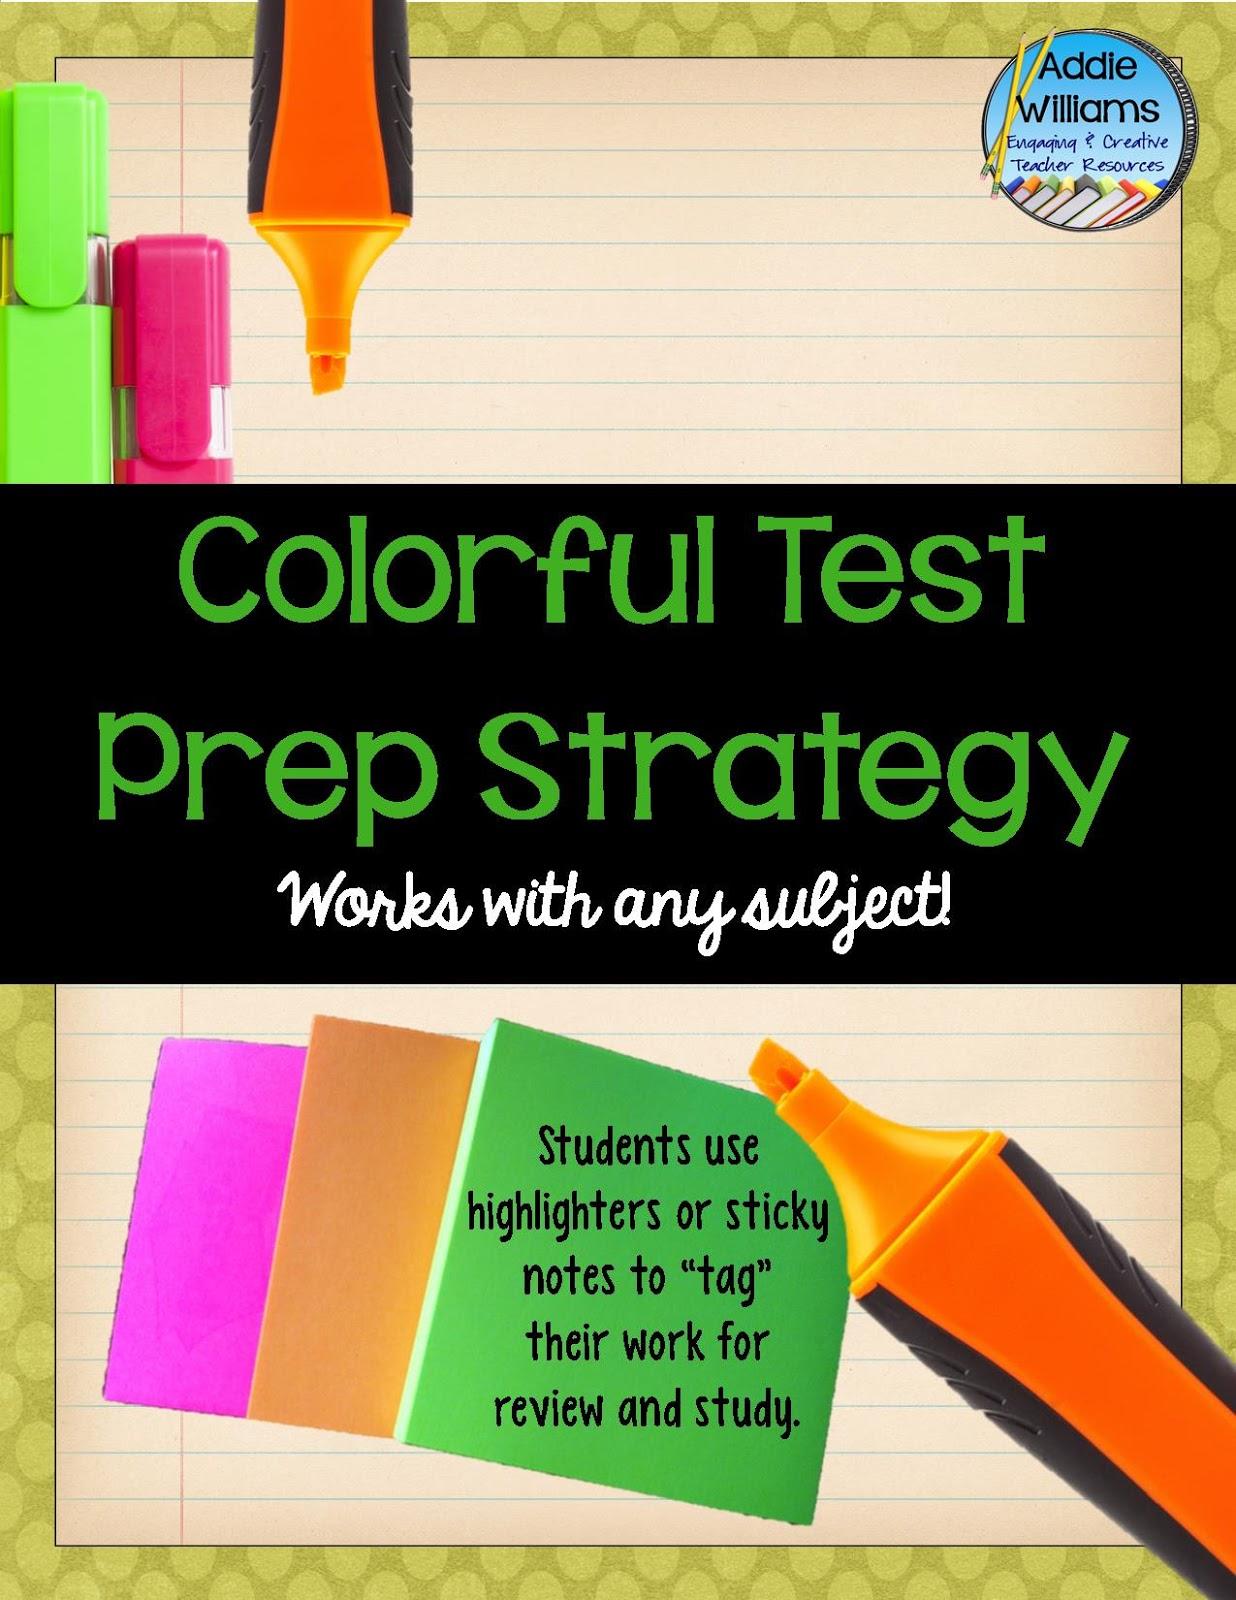 https://www.teacherspayteachers.com/Product/Test-Prep-Strategy-for-ANY-subject-FREE-534109